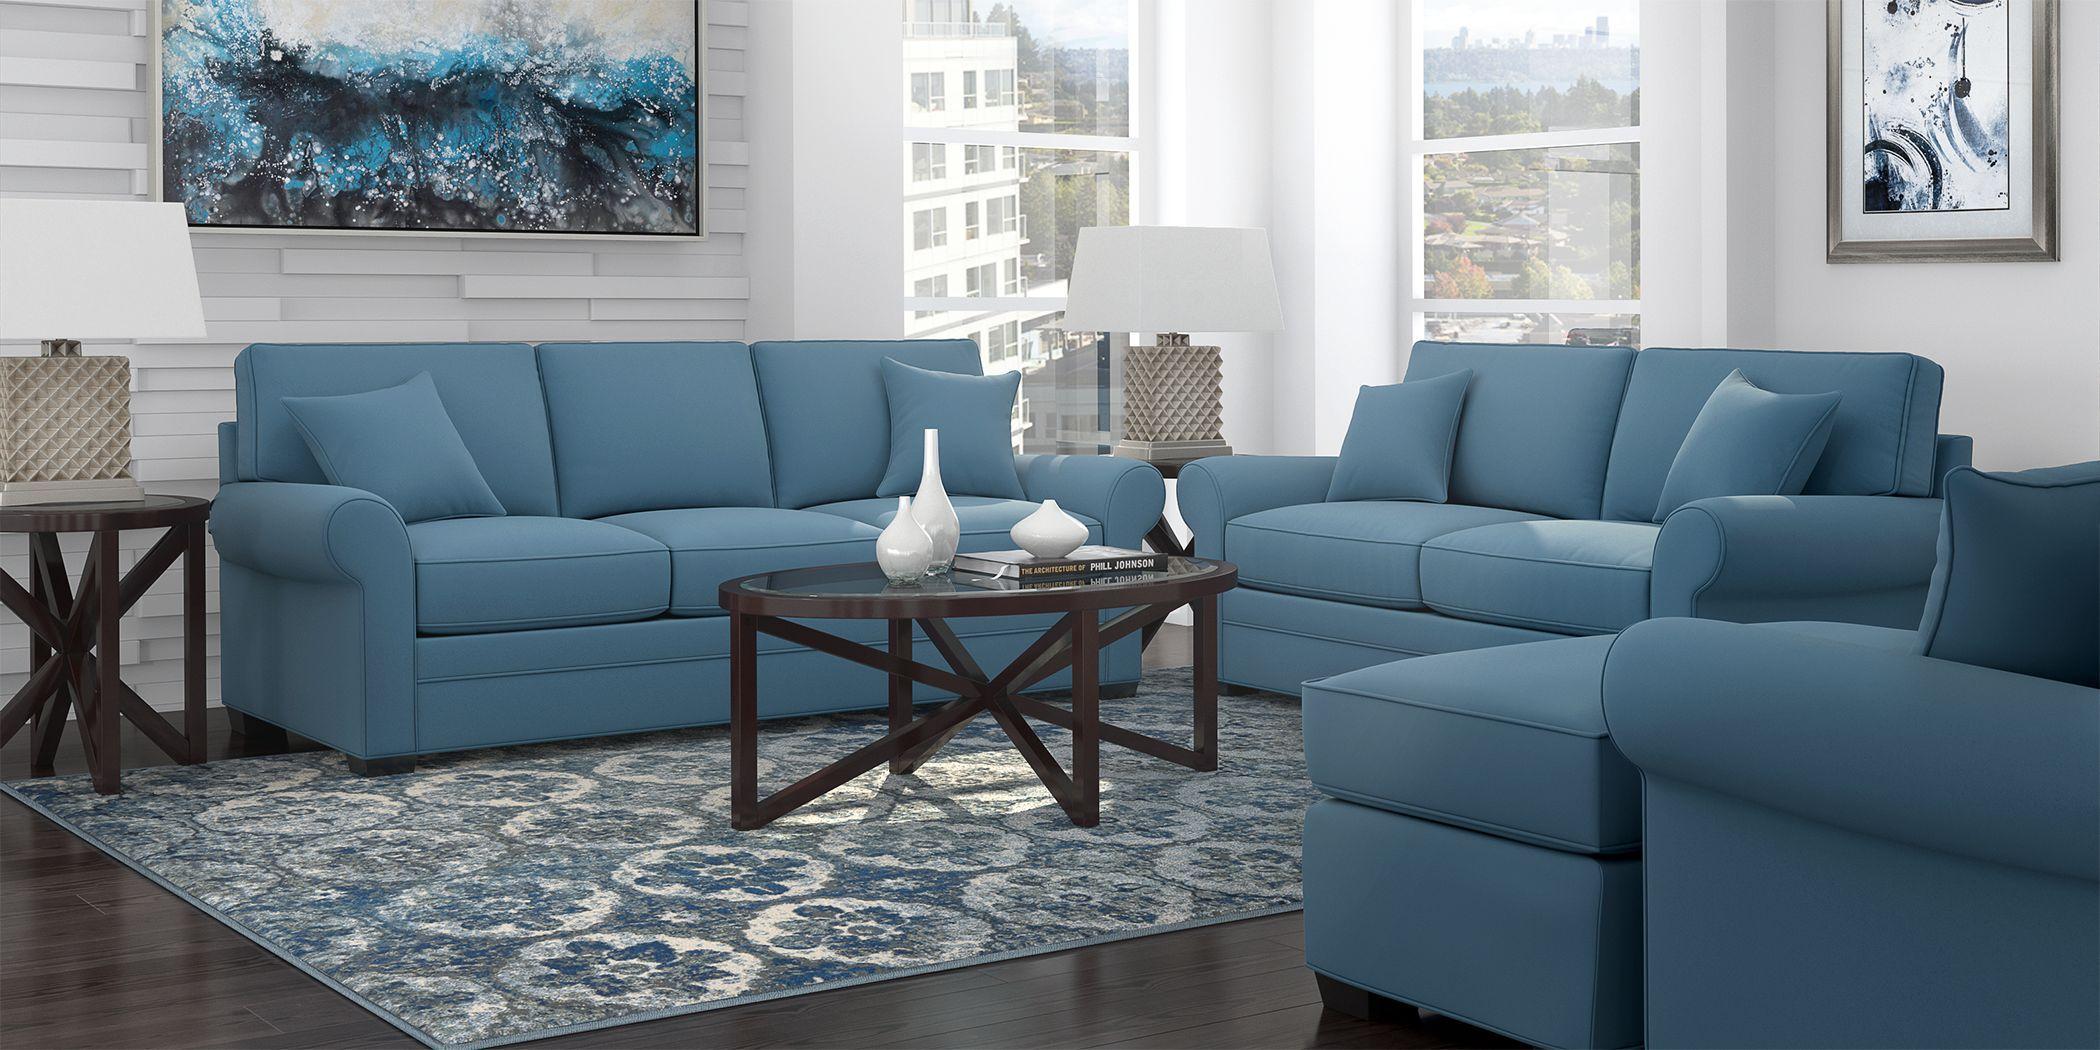 Cindy Crawford Home Bellingham Indigo Microfiber 7 Pc Living Room Teal Blue Living Room Decor Blue Living Room Decor Teal Blue Living Room